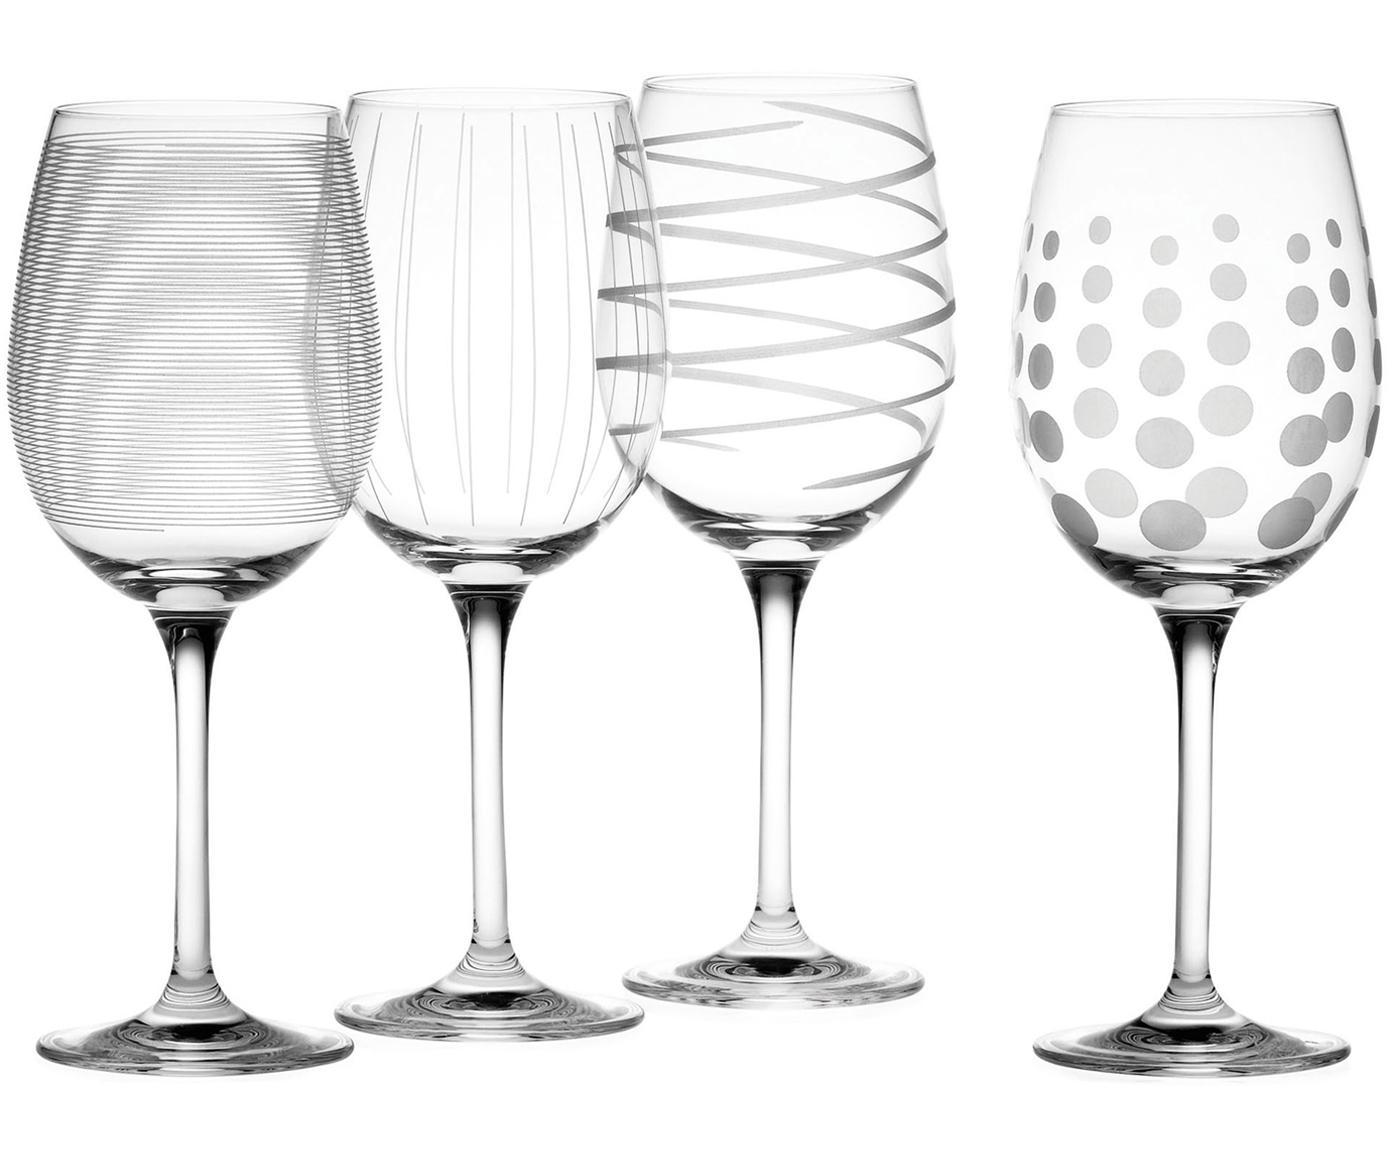 Set 4 bicchieri vino bianco con decoro in argento Mikasa, Vetro, Trasparente, argentato, Ø 9 x Alt. 23 cm